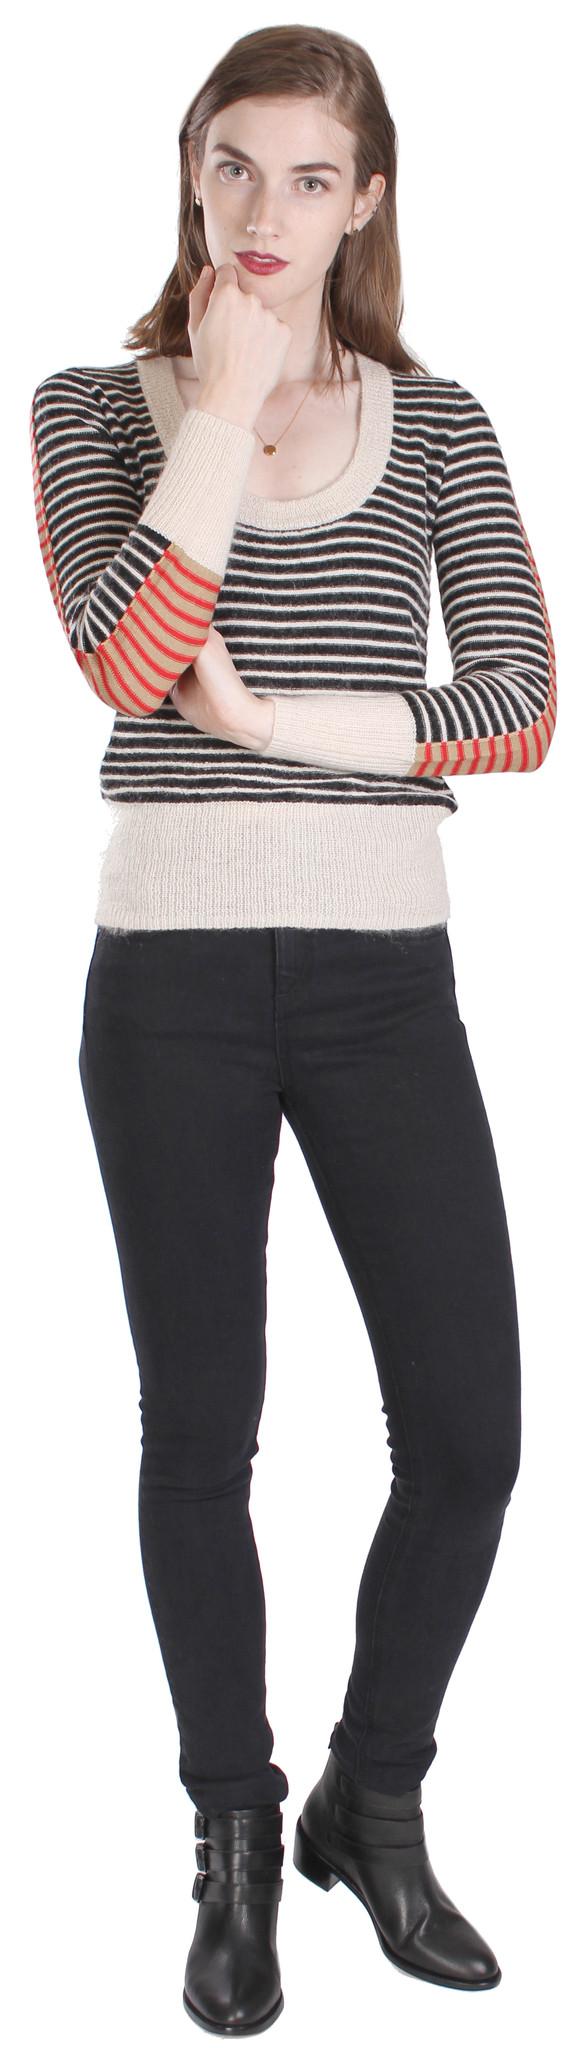 Sonia by Sonia Rykiel Mohair Stripe Sweater